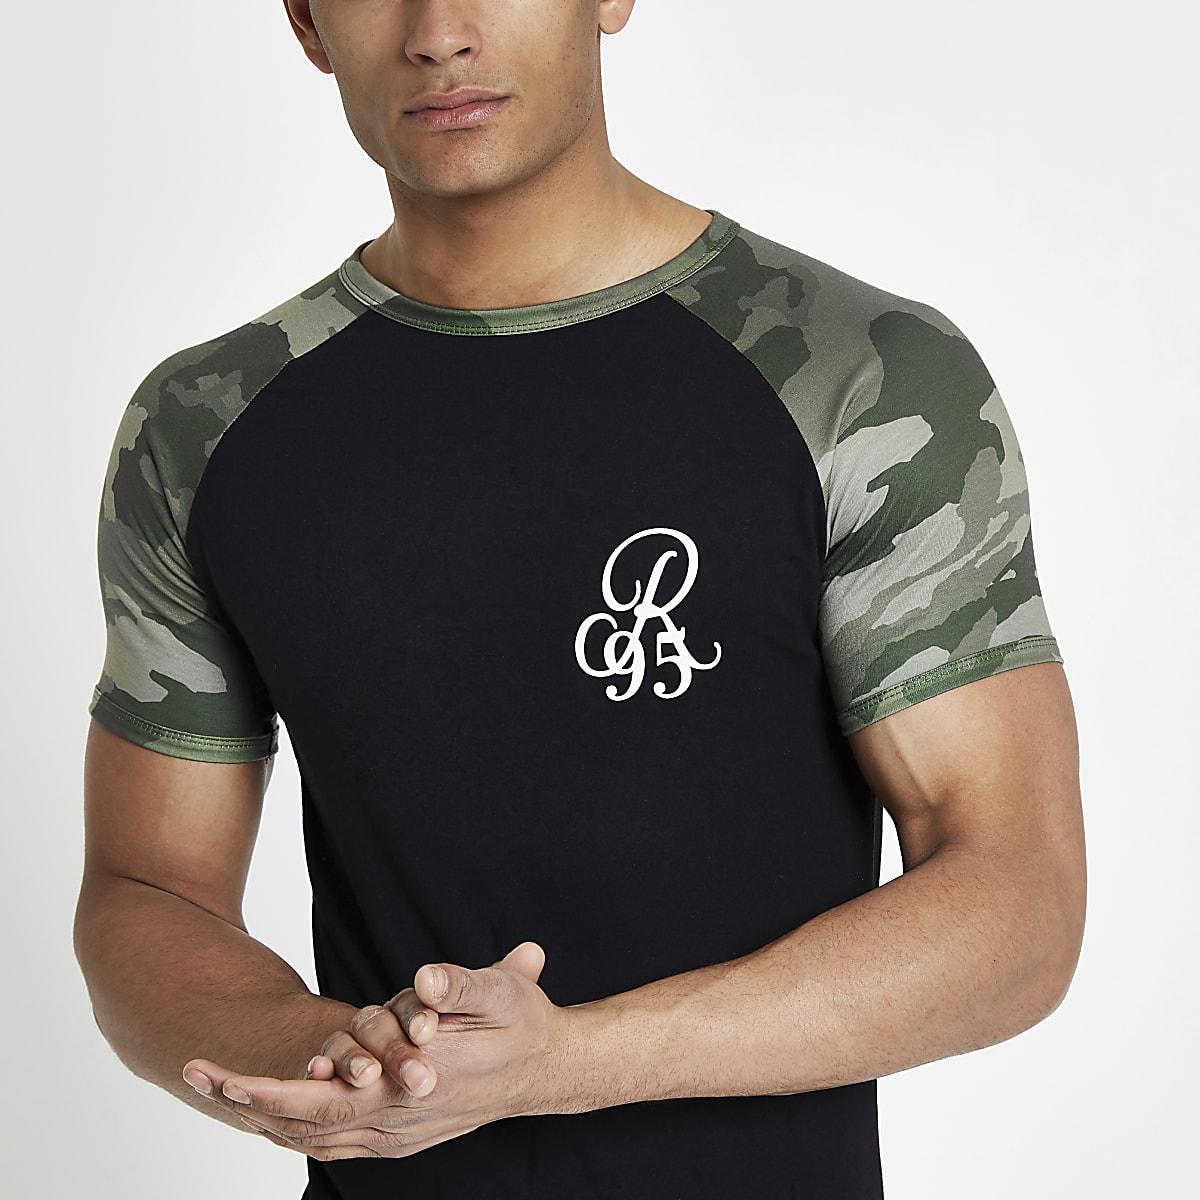 7bbb3f48 Black camo muscle fit raglan T-shirt - T-shirts - T-Shirts & Vests - men